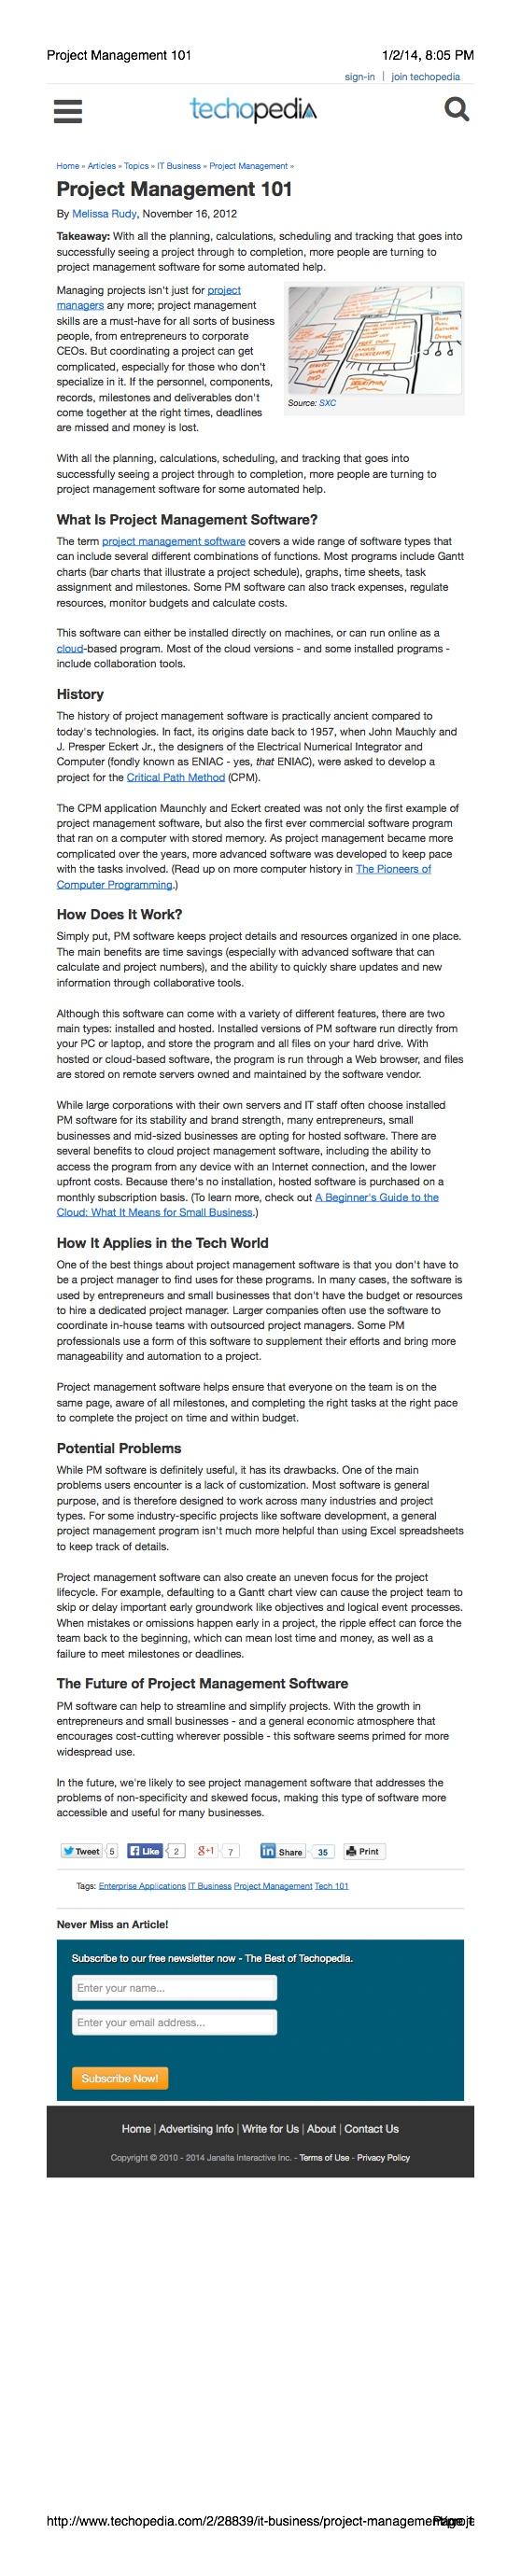 Project Management Article: Techopedia